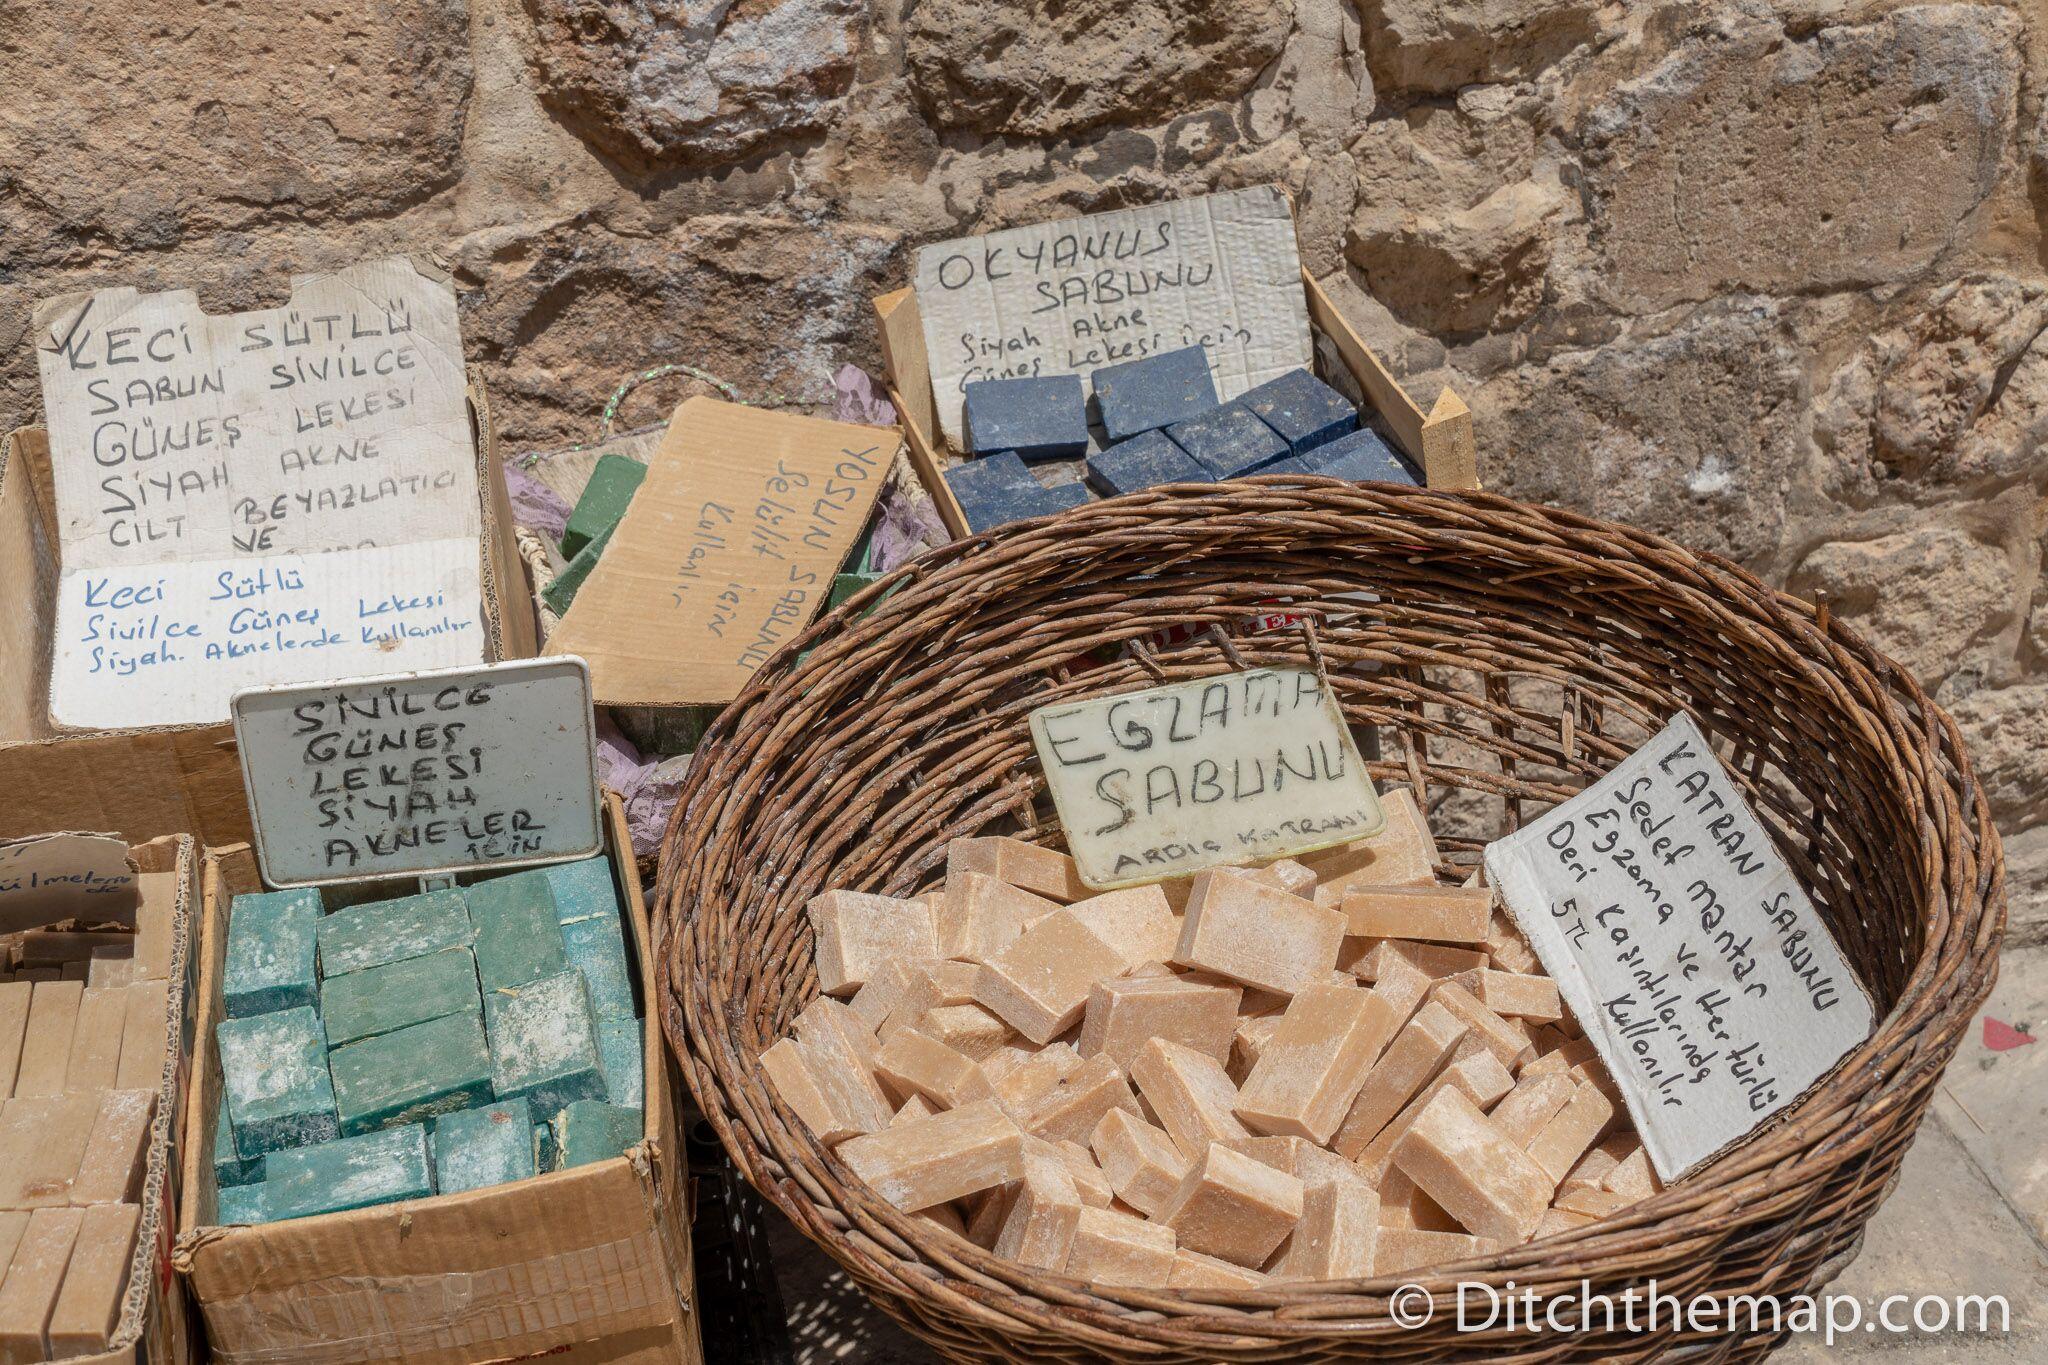 Homemade soap for sale on the street in Mardin, Turkey